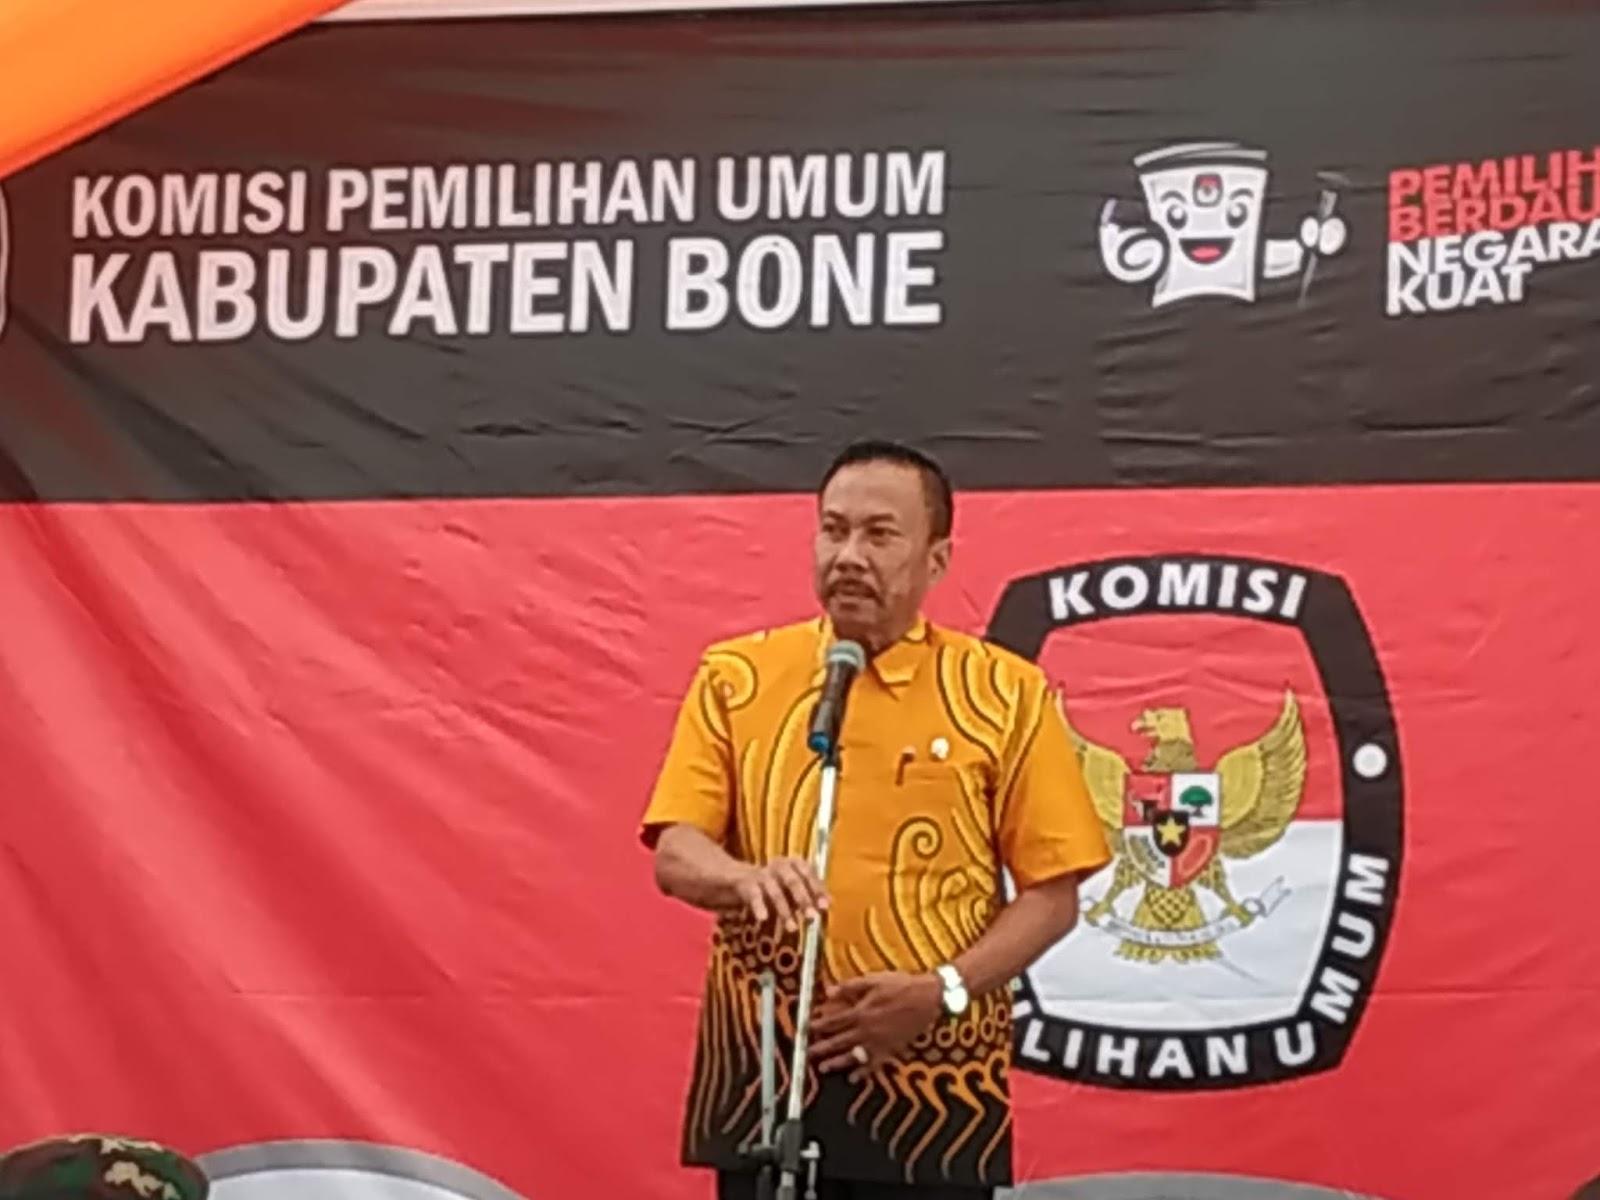 Komisioner KPU Bone Curhat, Wabup Bone : Tidak Ada Alasan Pemilu Tak Terlaksana